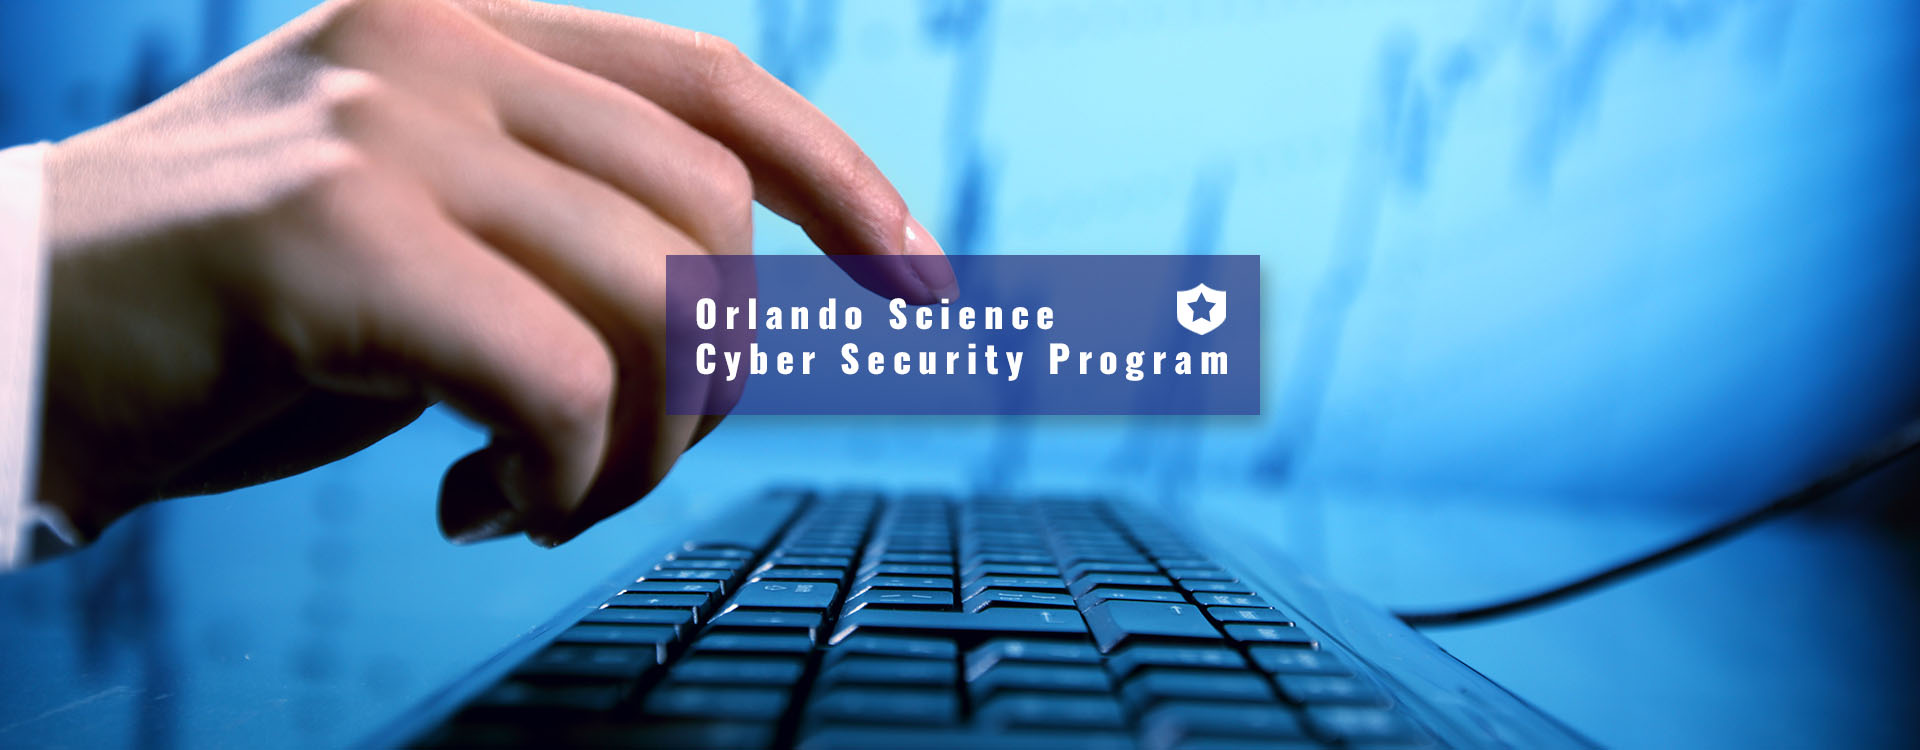 cyber-security-program